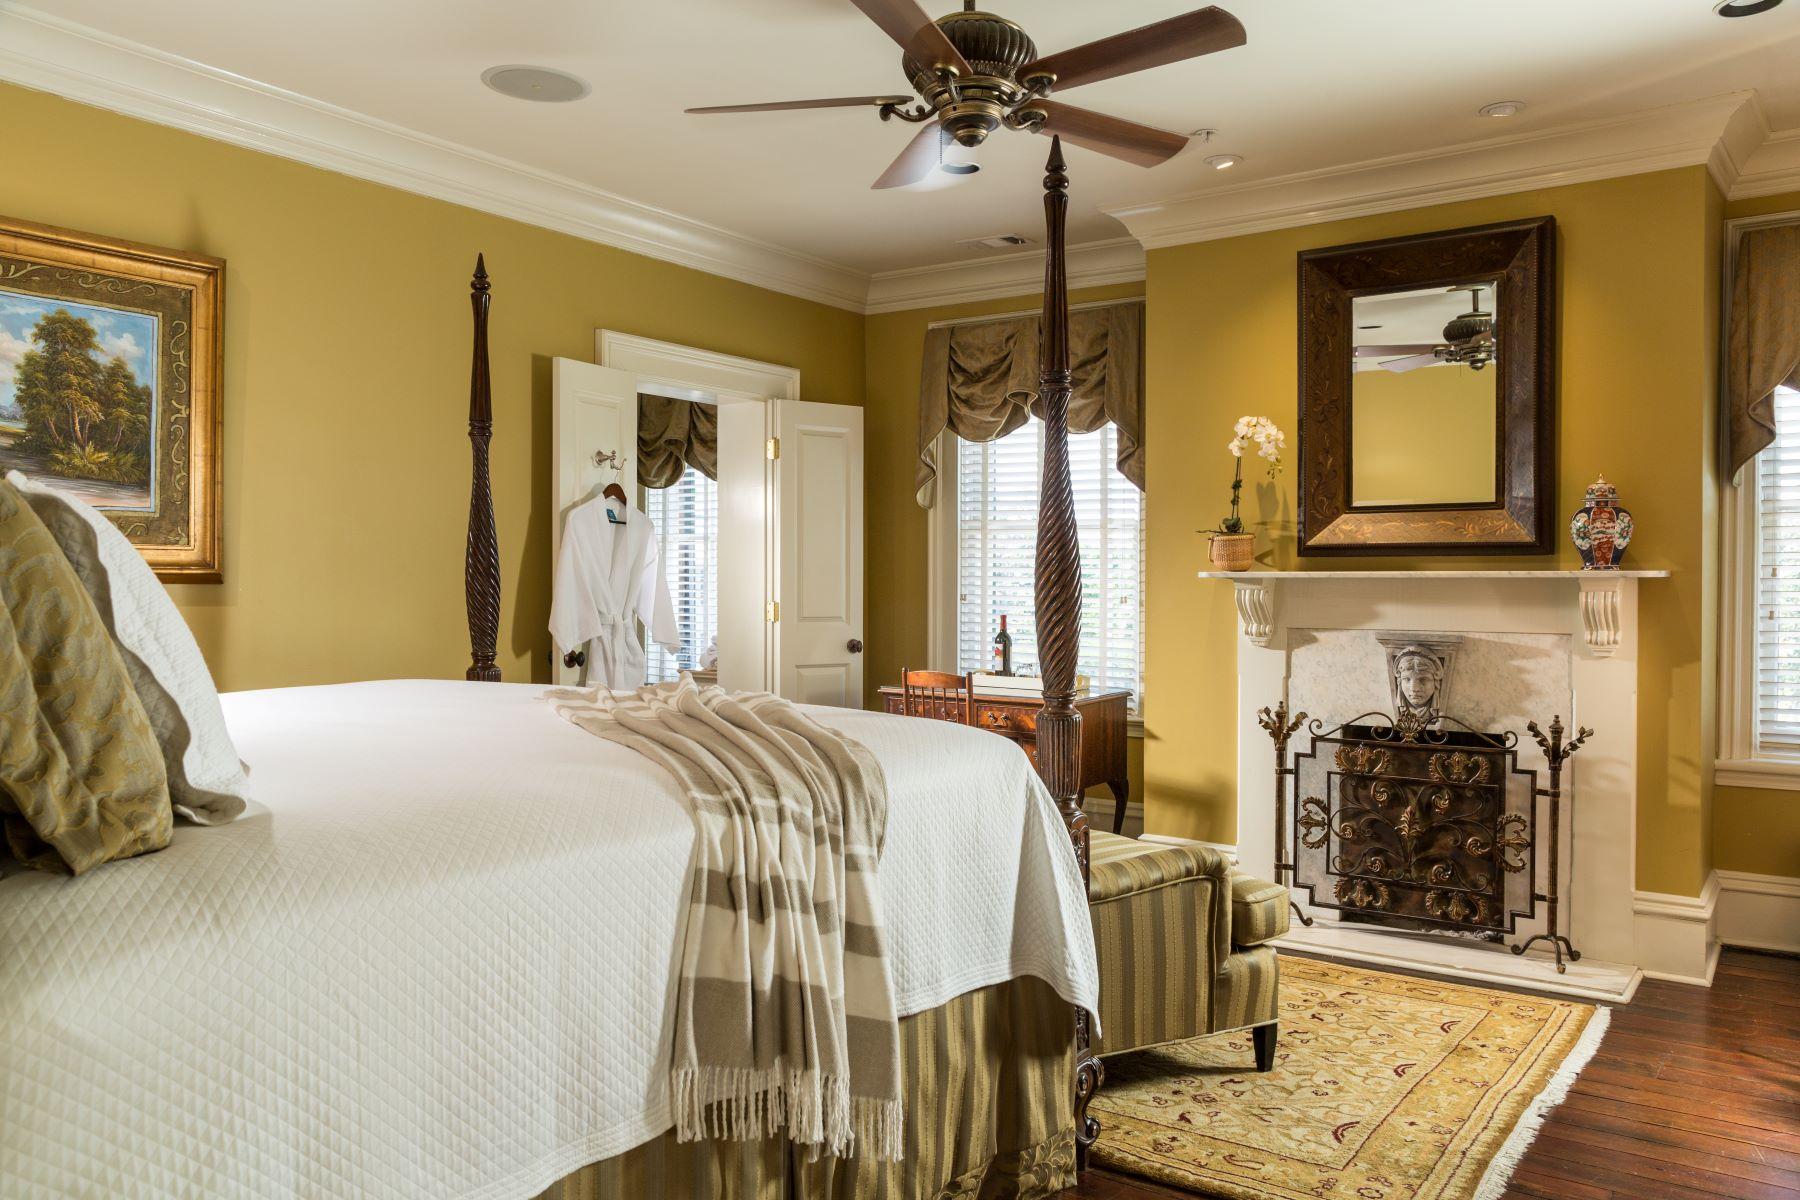 Inn-West-Liberty-Rooms-JohnsonSquare-1Rev.jpg